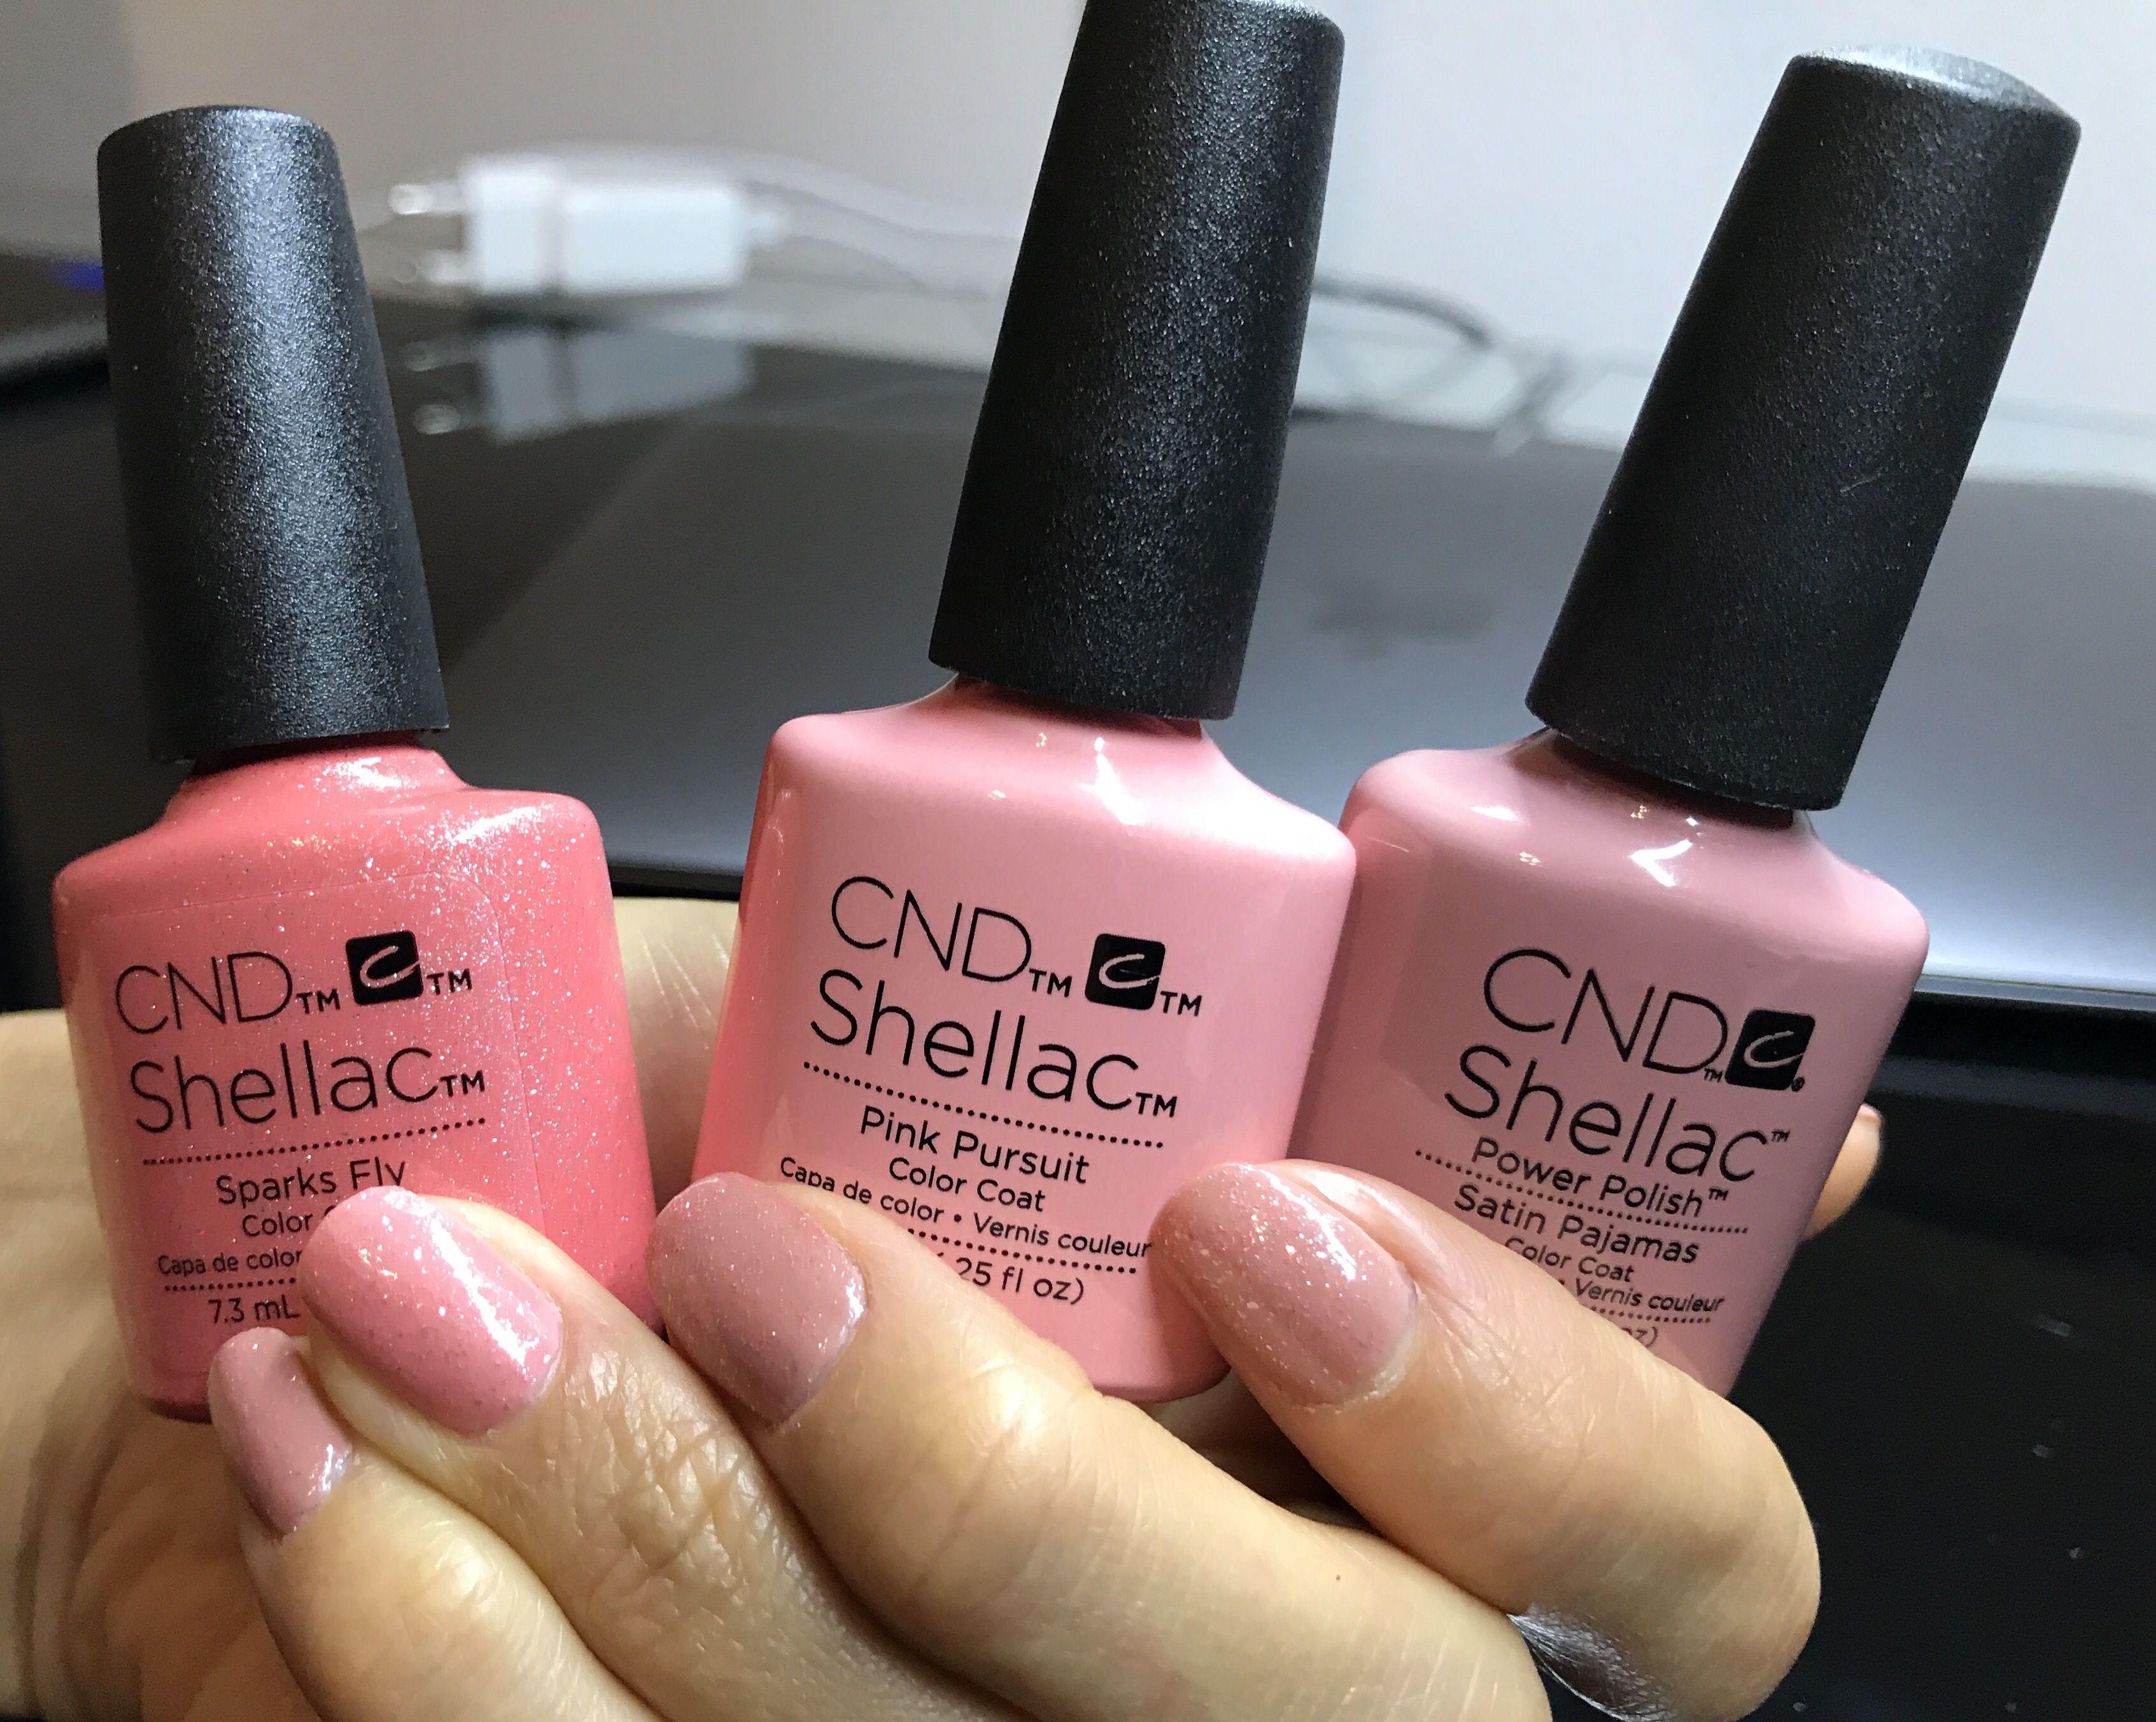 Cnd Shellac Sparks Fly Pink Pursuit Satin Pajamas Gel Nail Colors Shellac Cnd Shellac